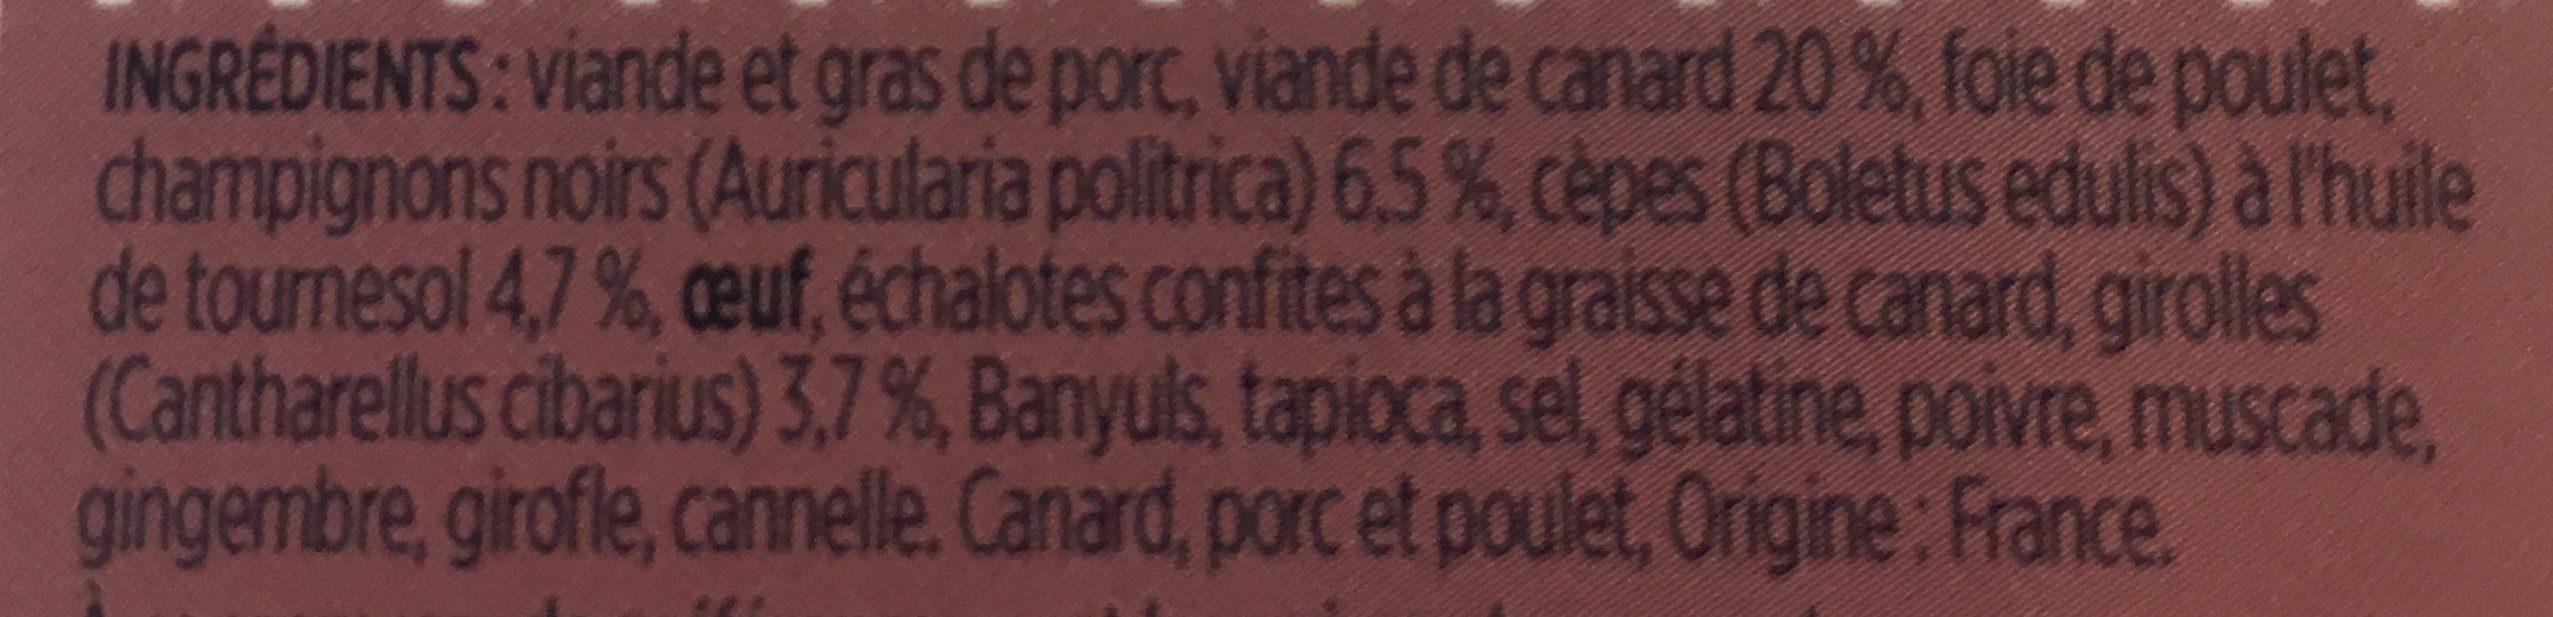 Terrine de canard forestière - Ingrediënten